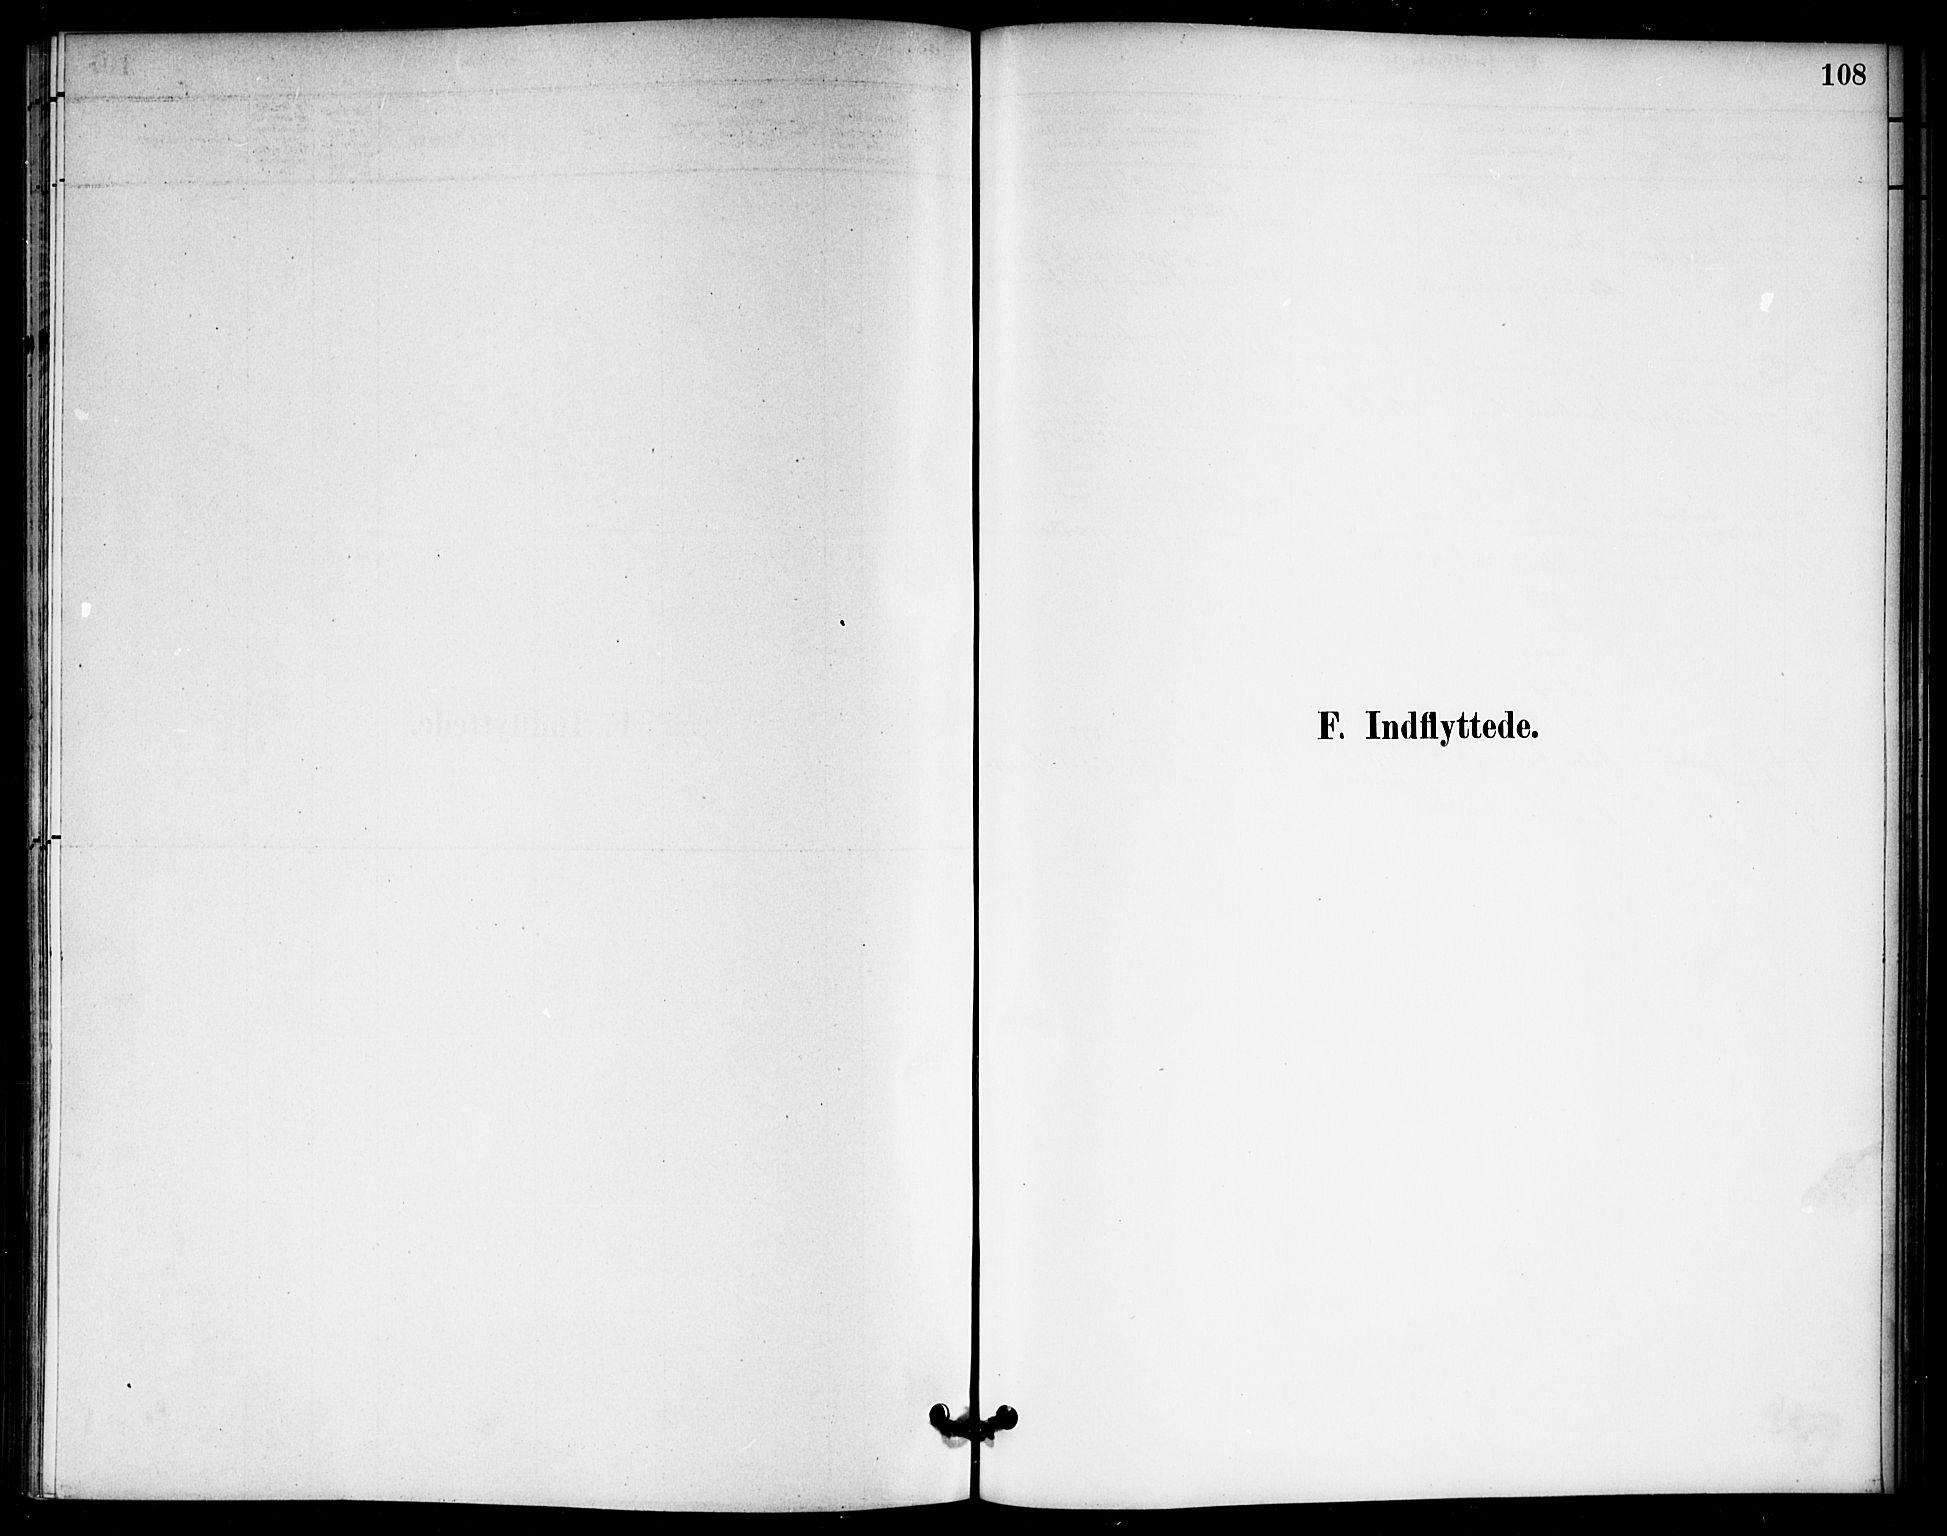 SAO, Nannestad prestekontor Kirkebøker, F/Fb/L0001: Ministerialbok nr. II 1, 1881-1890, s. 108